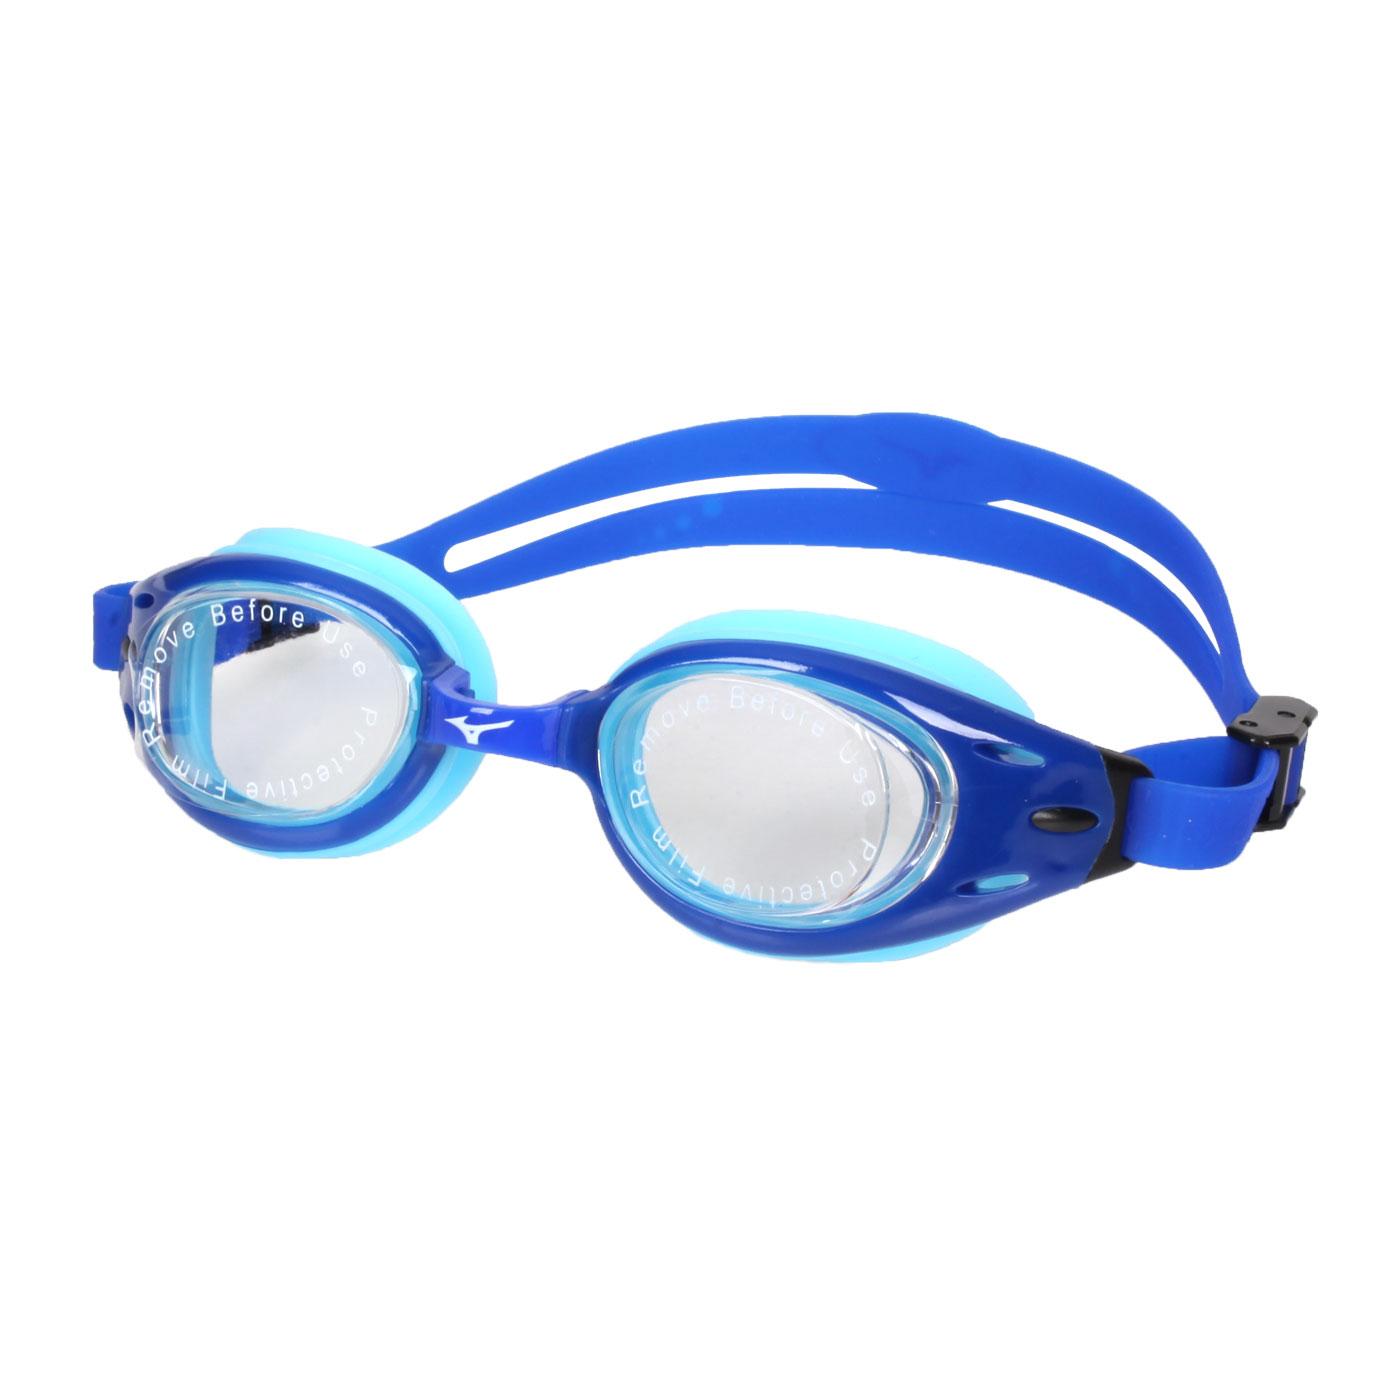 MIZUNO 兒童泳鏡  SWIMN3TF105000-27